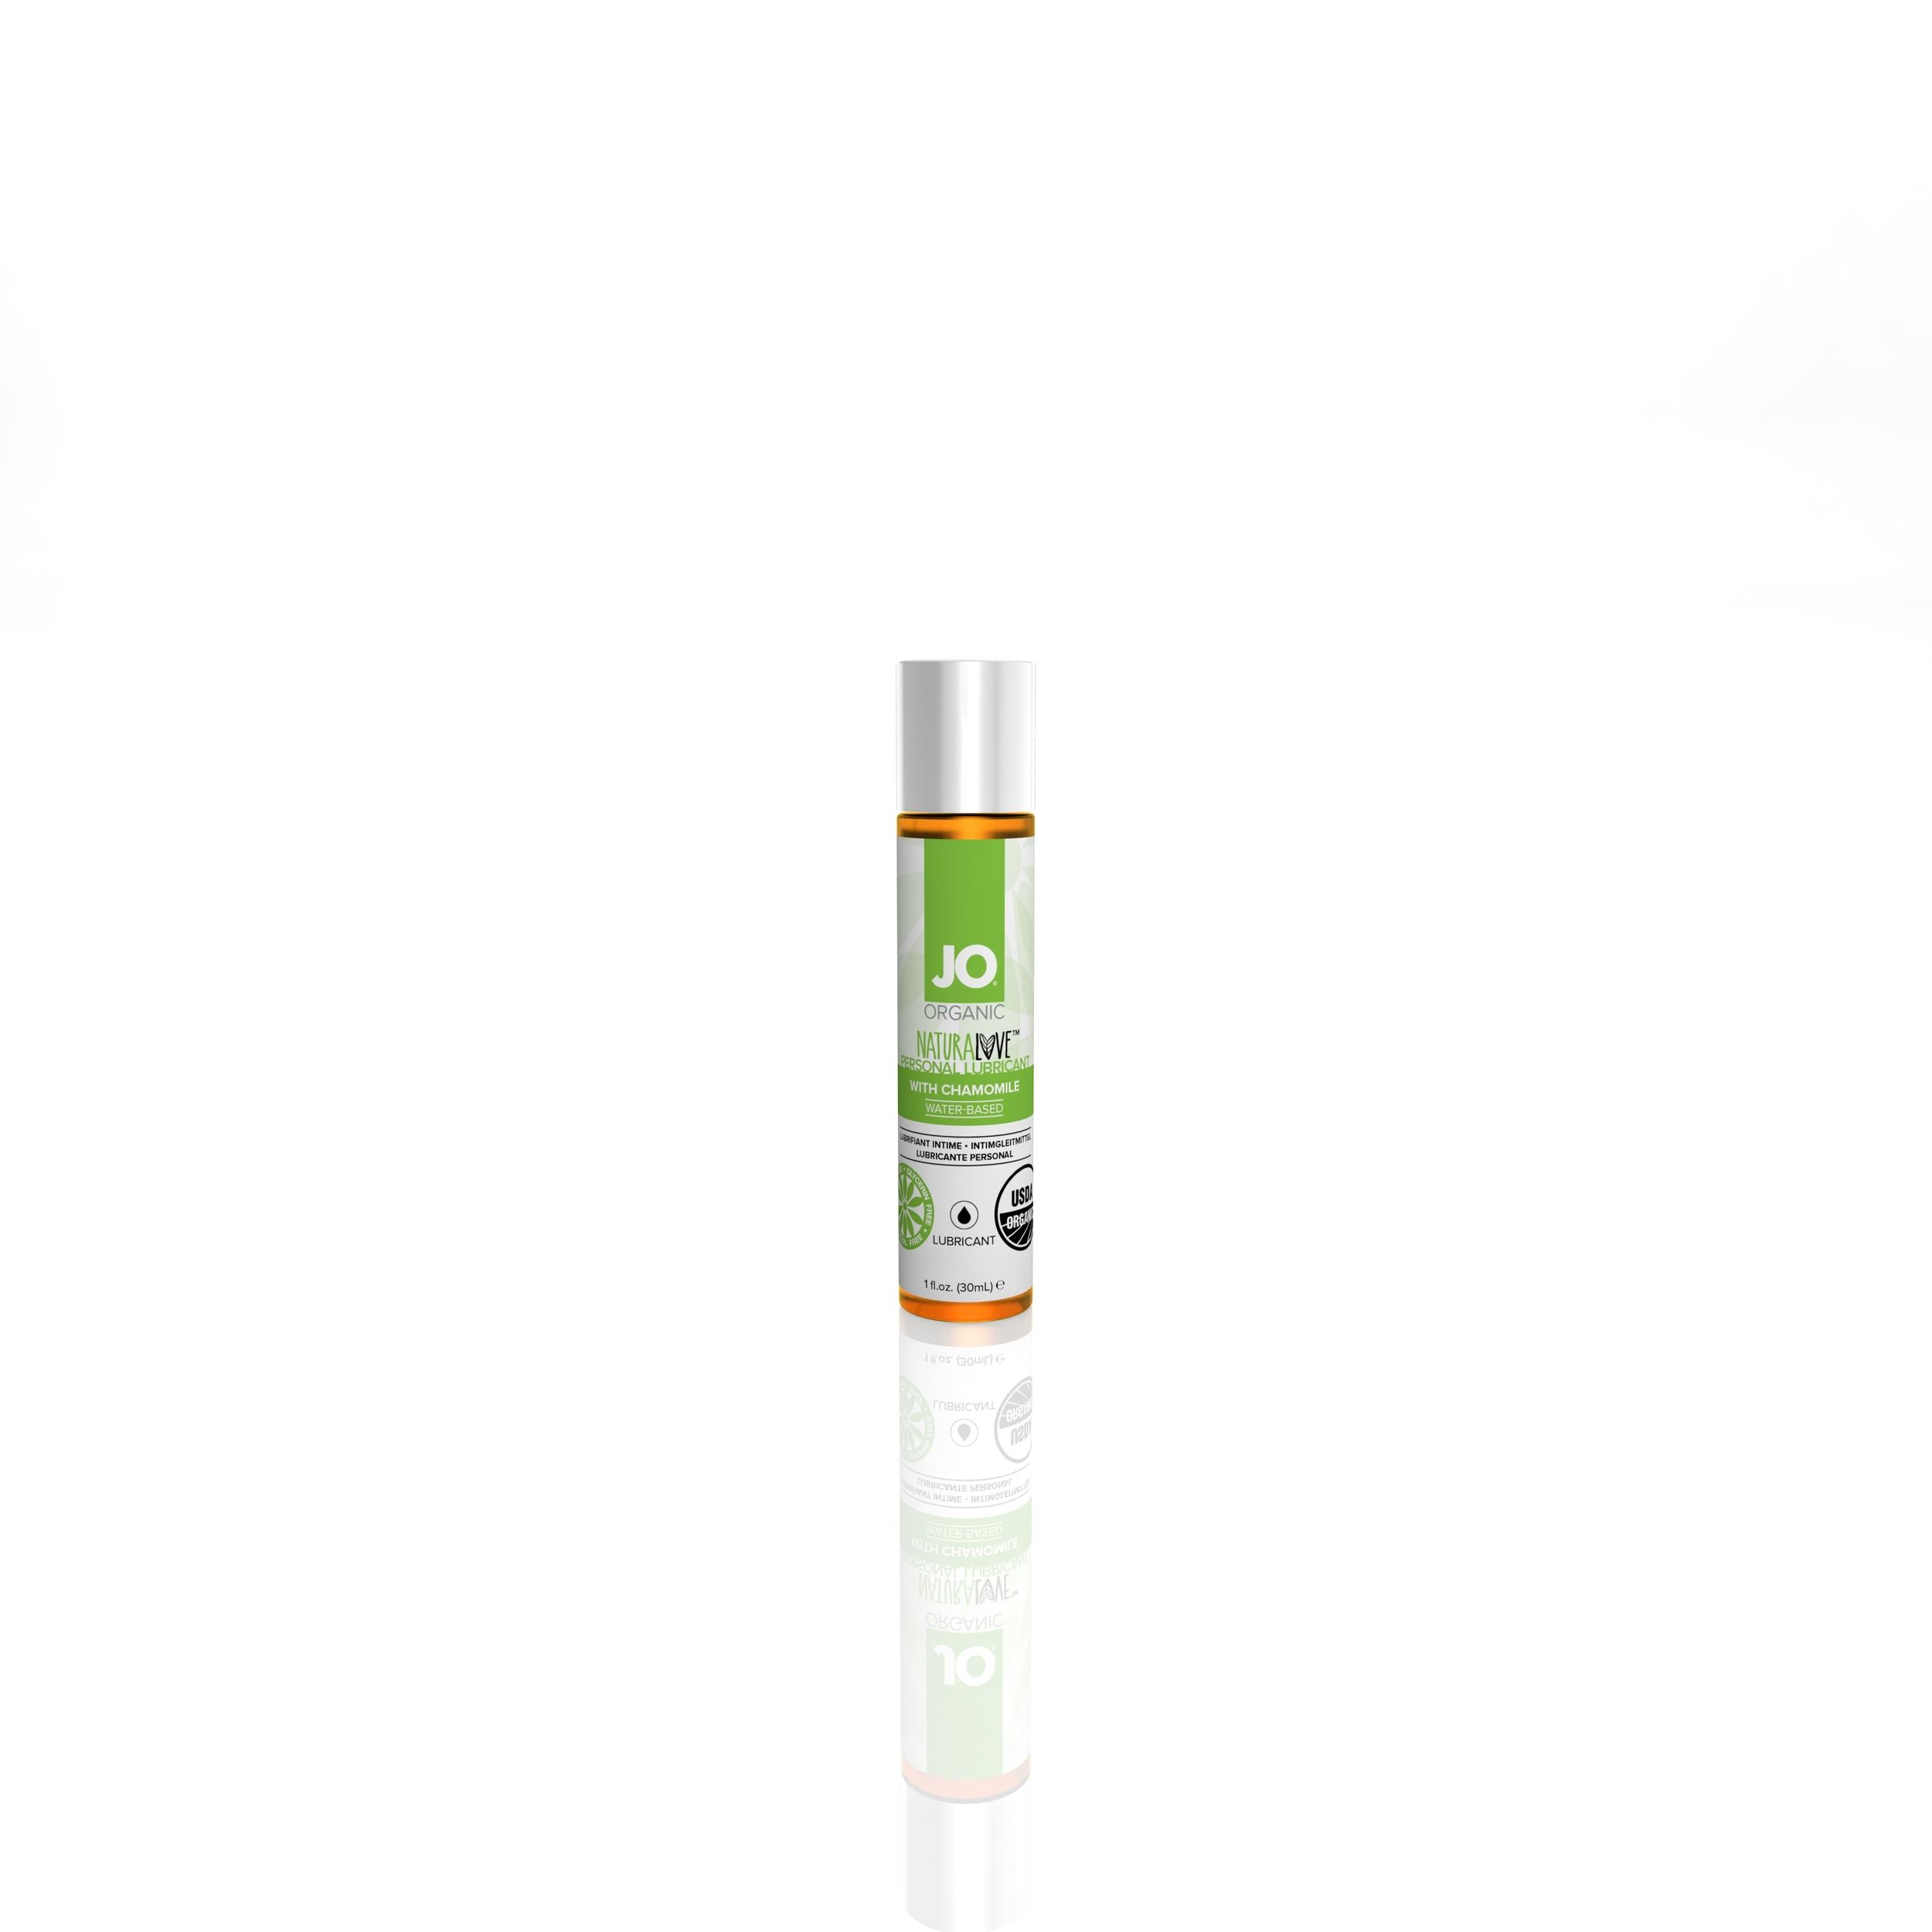 JO USDA Organic 1oz Original Lubricant (straight on) (white)001.jpg